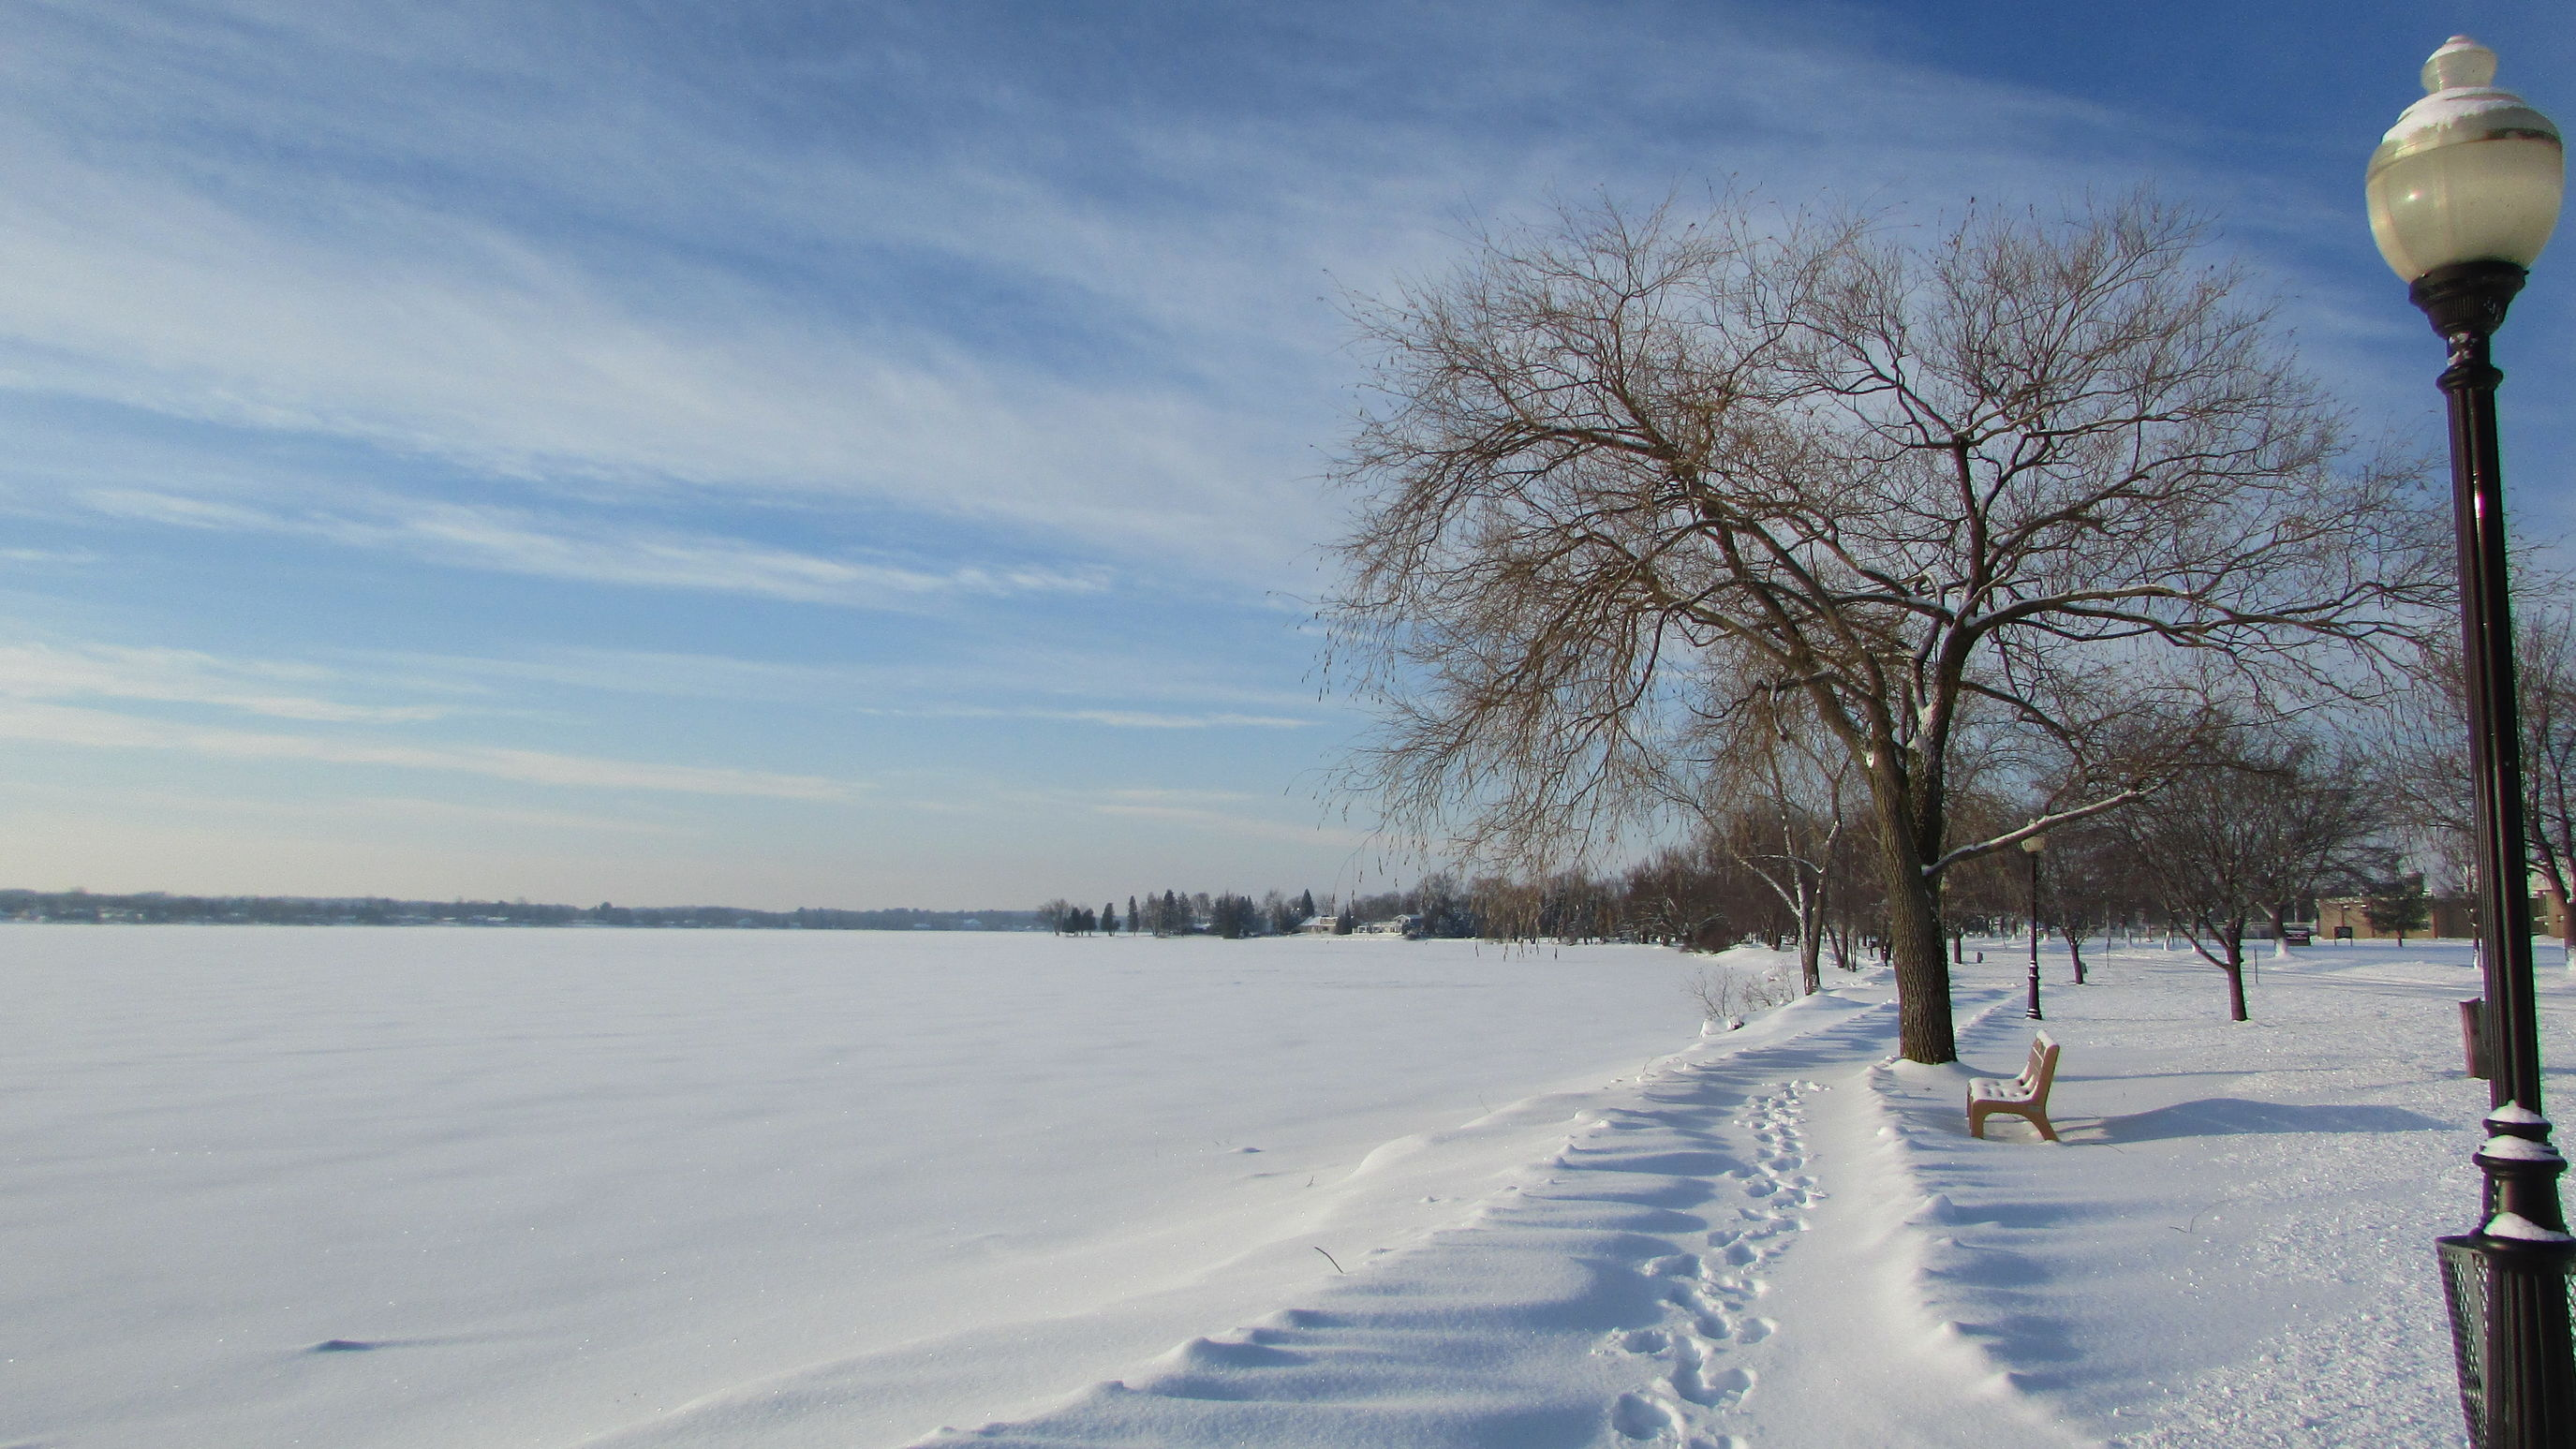 Taking Photos Around The Lake Retro Streetlight Snowy Shore Sunshine ☀ Blue Sky And Clouds Quietness Footprints Lake Cadillac Beatiful Day Pure Michigan